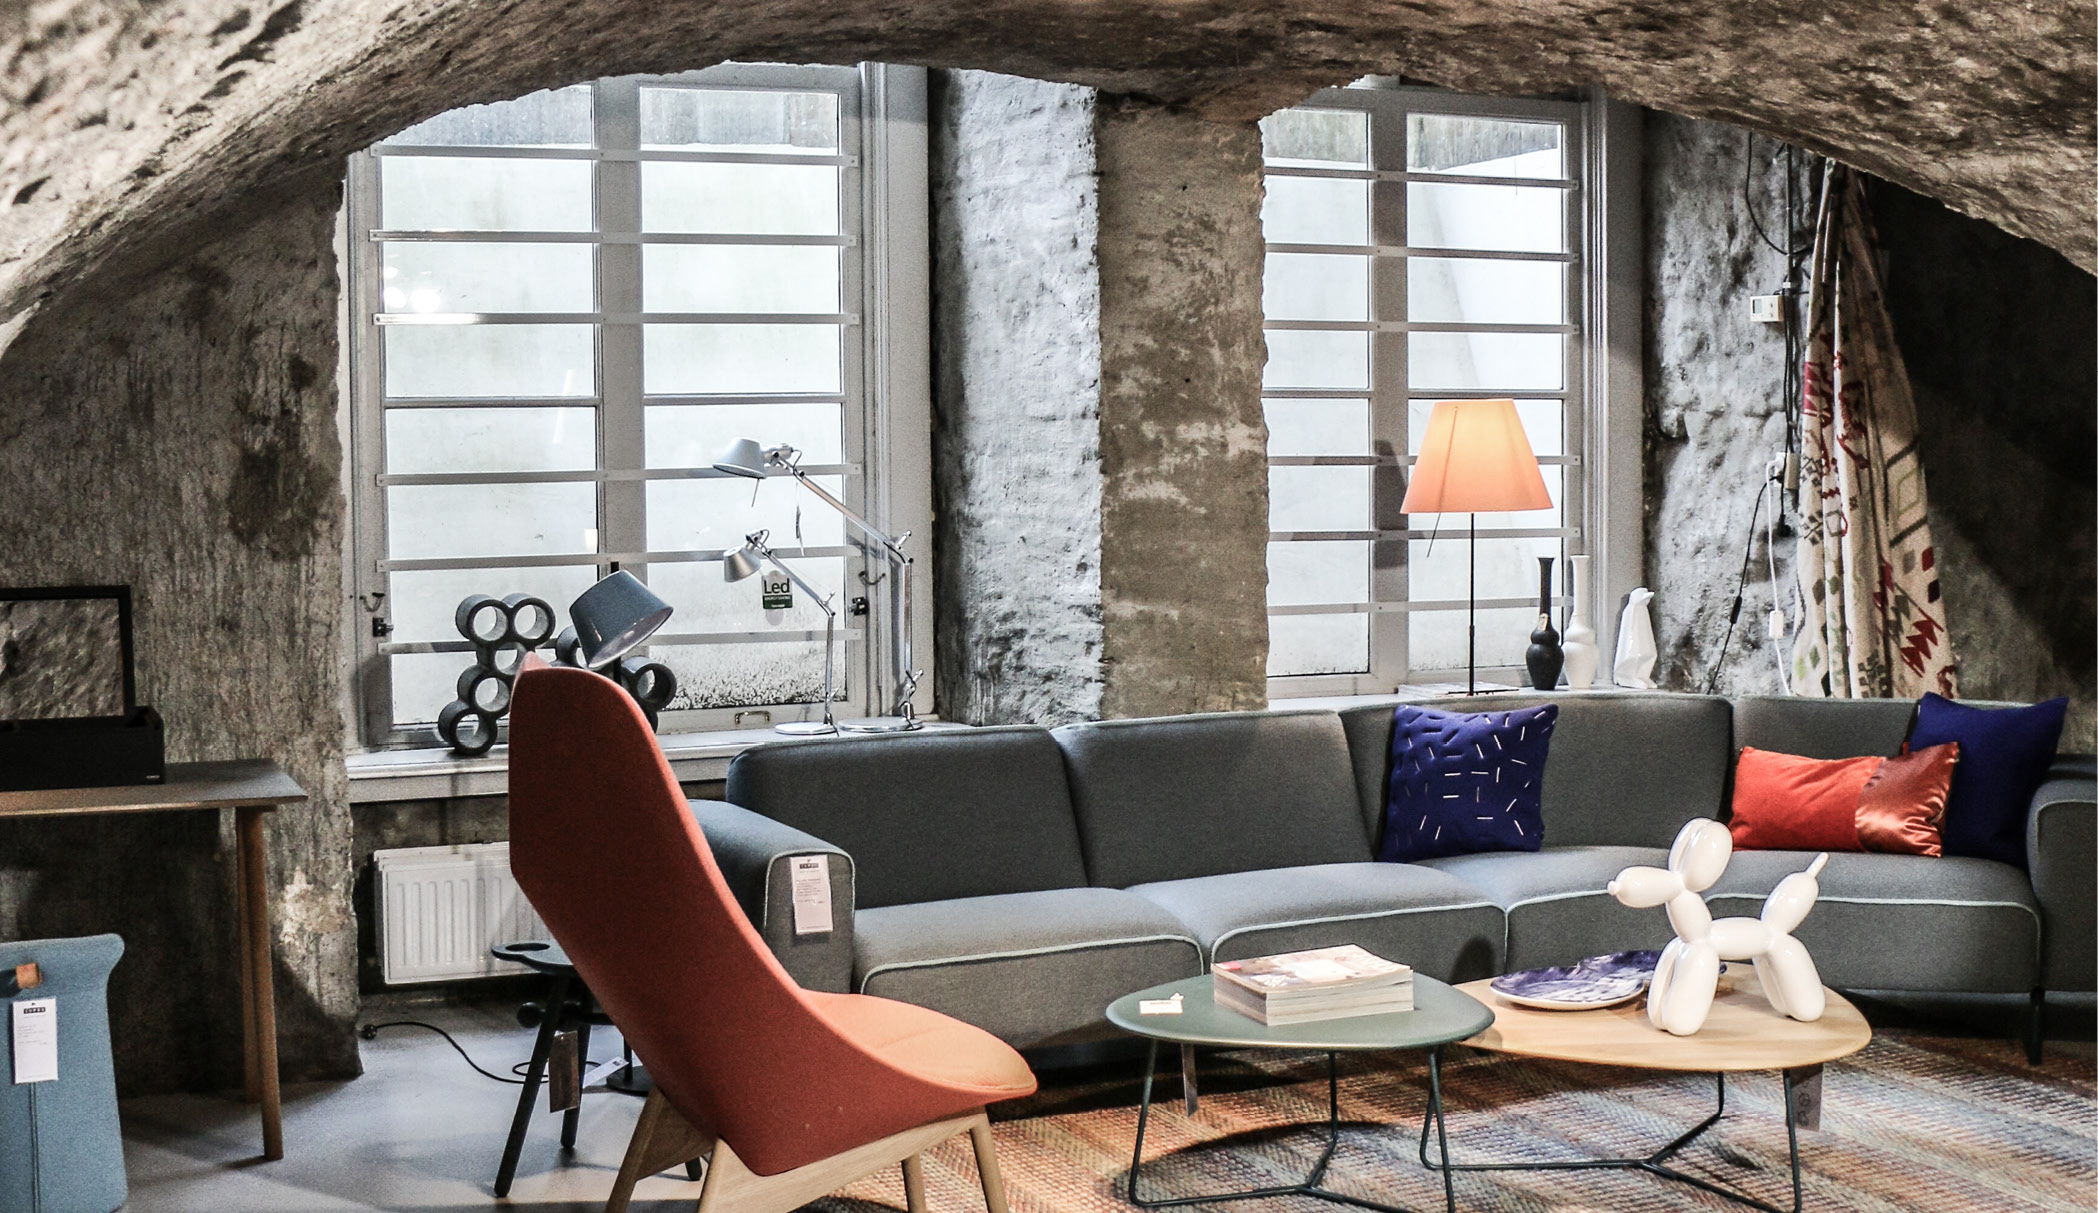 Design Meubels Utrecht : Design meubels utrecht st jacobsstraat riske design wonen